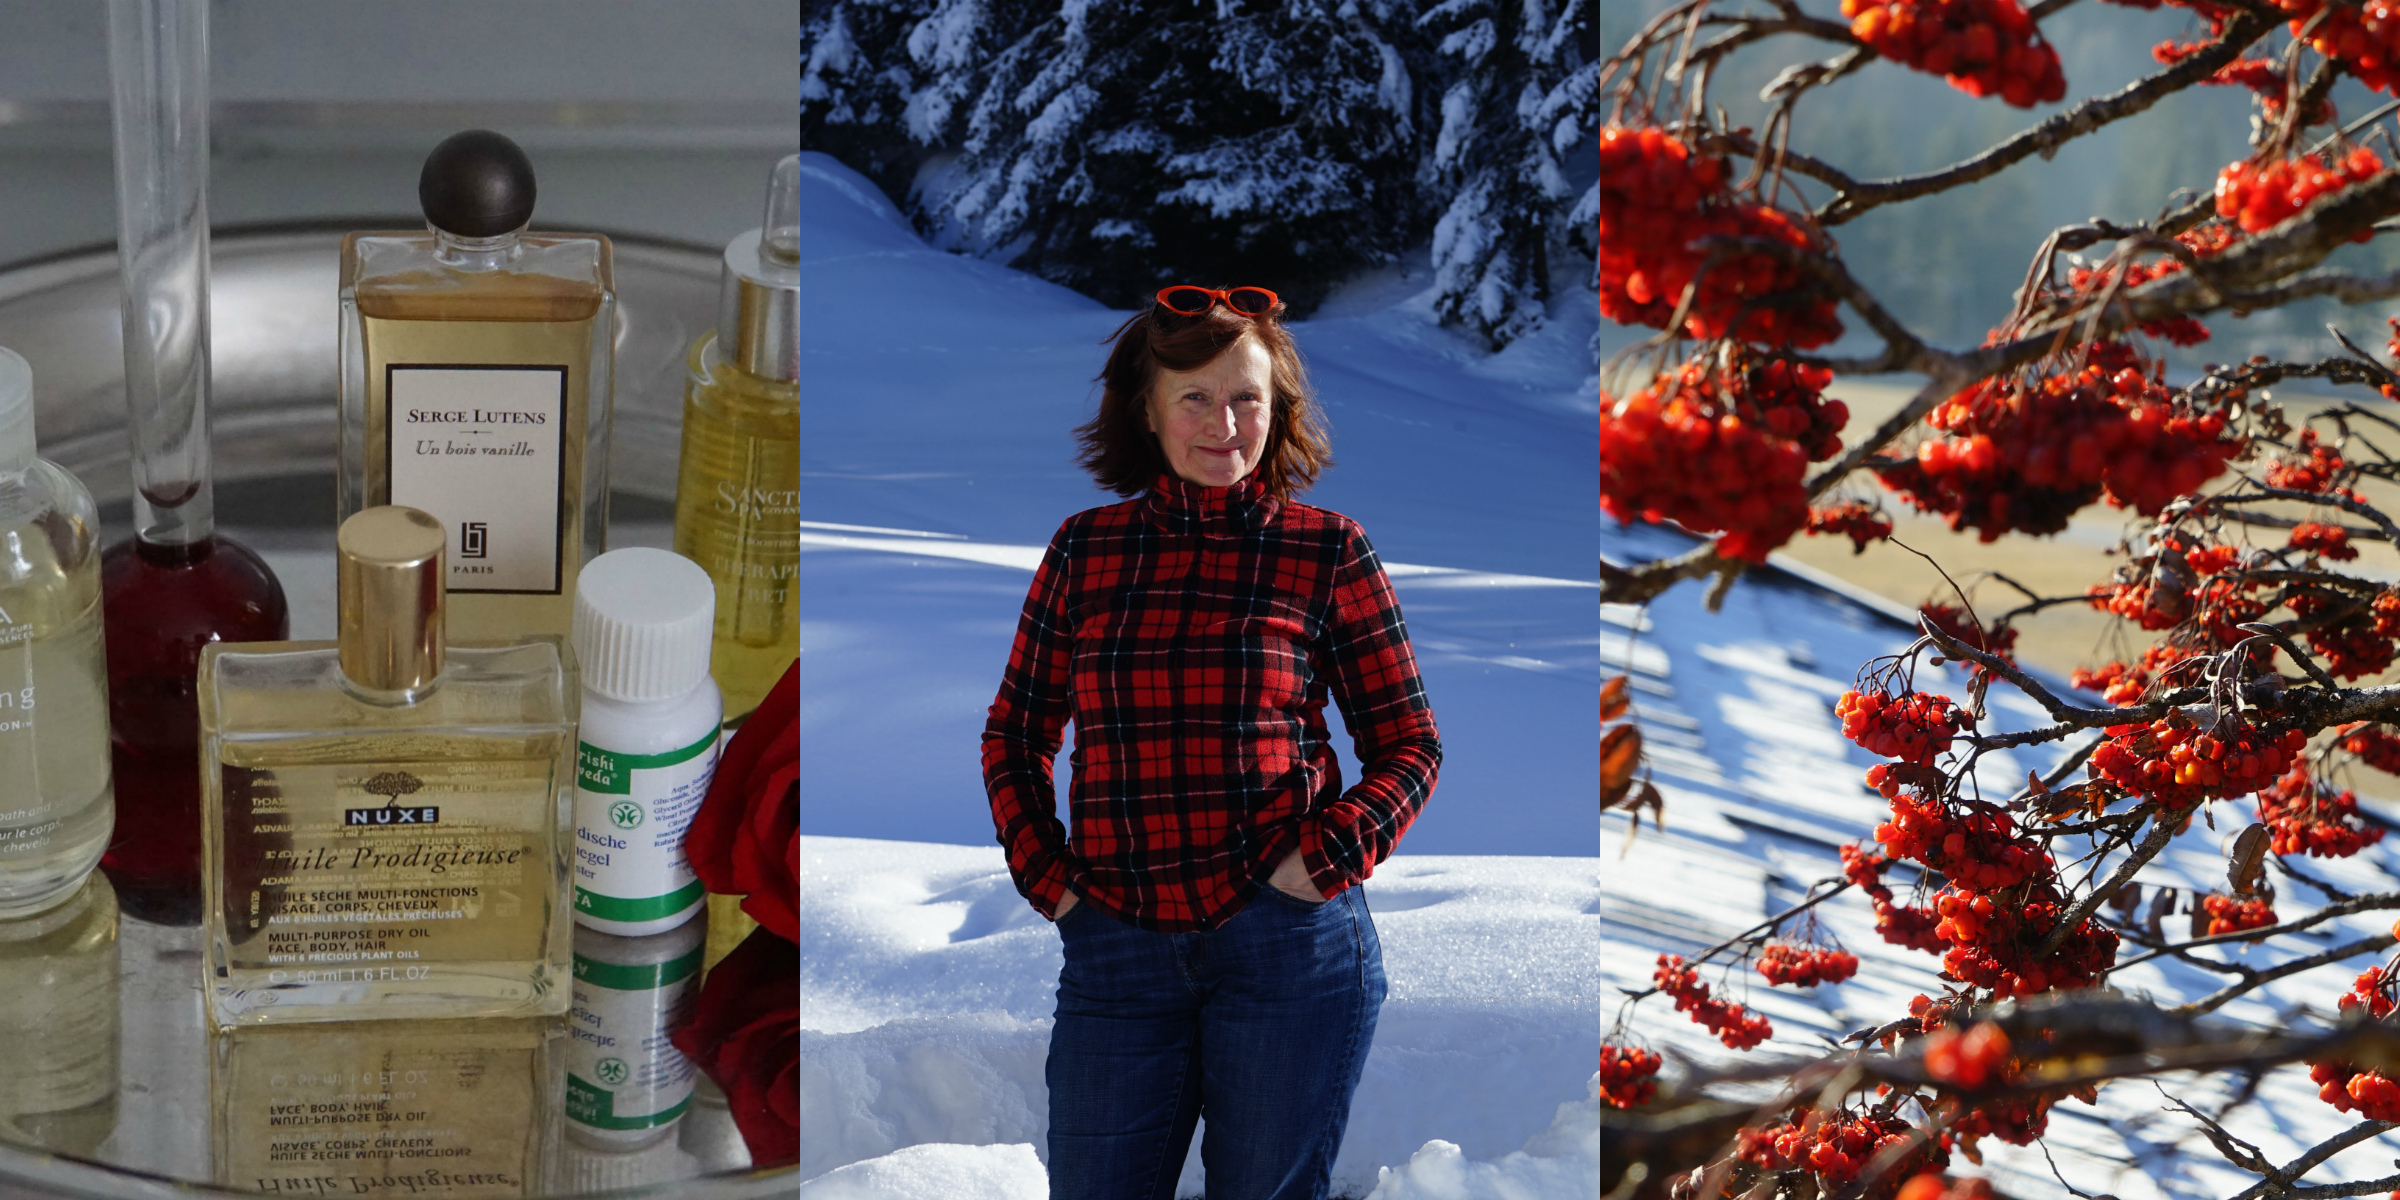 Ü60 Bloggerin Ursel vom Iknmlo Fashionblog für Frauen ab 40 über Anti-Aging